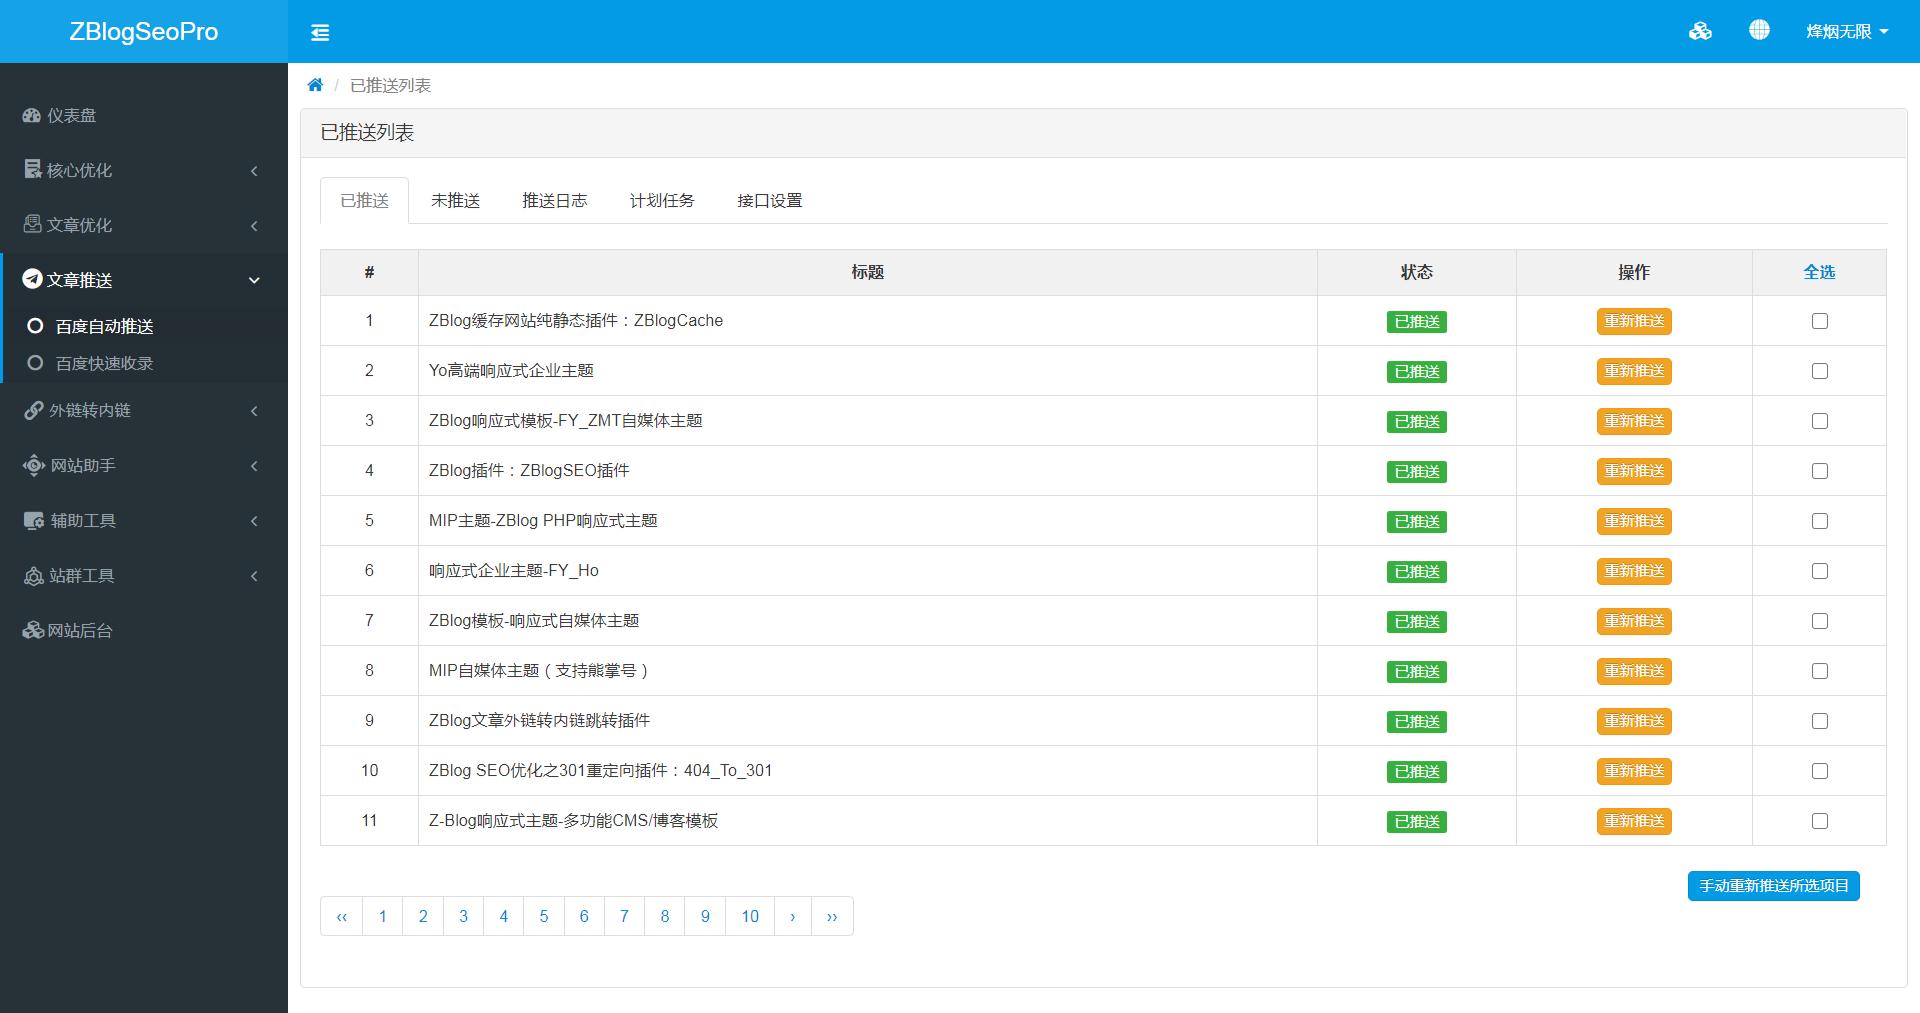 ZBlogSEO神器-建站必备、ZBlog排名优化助手  第10张